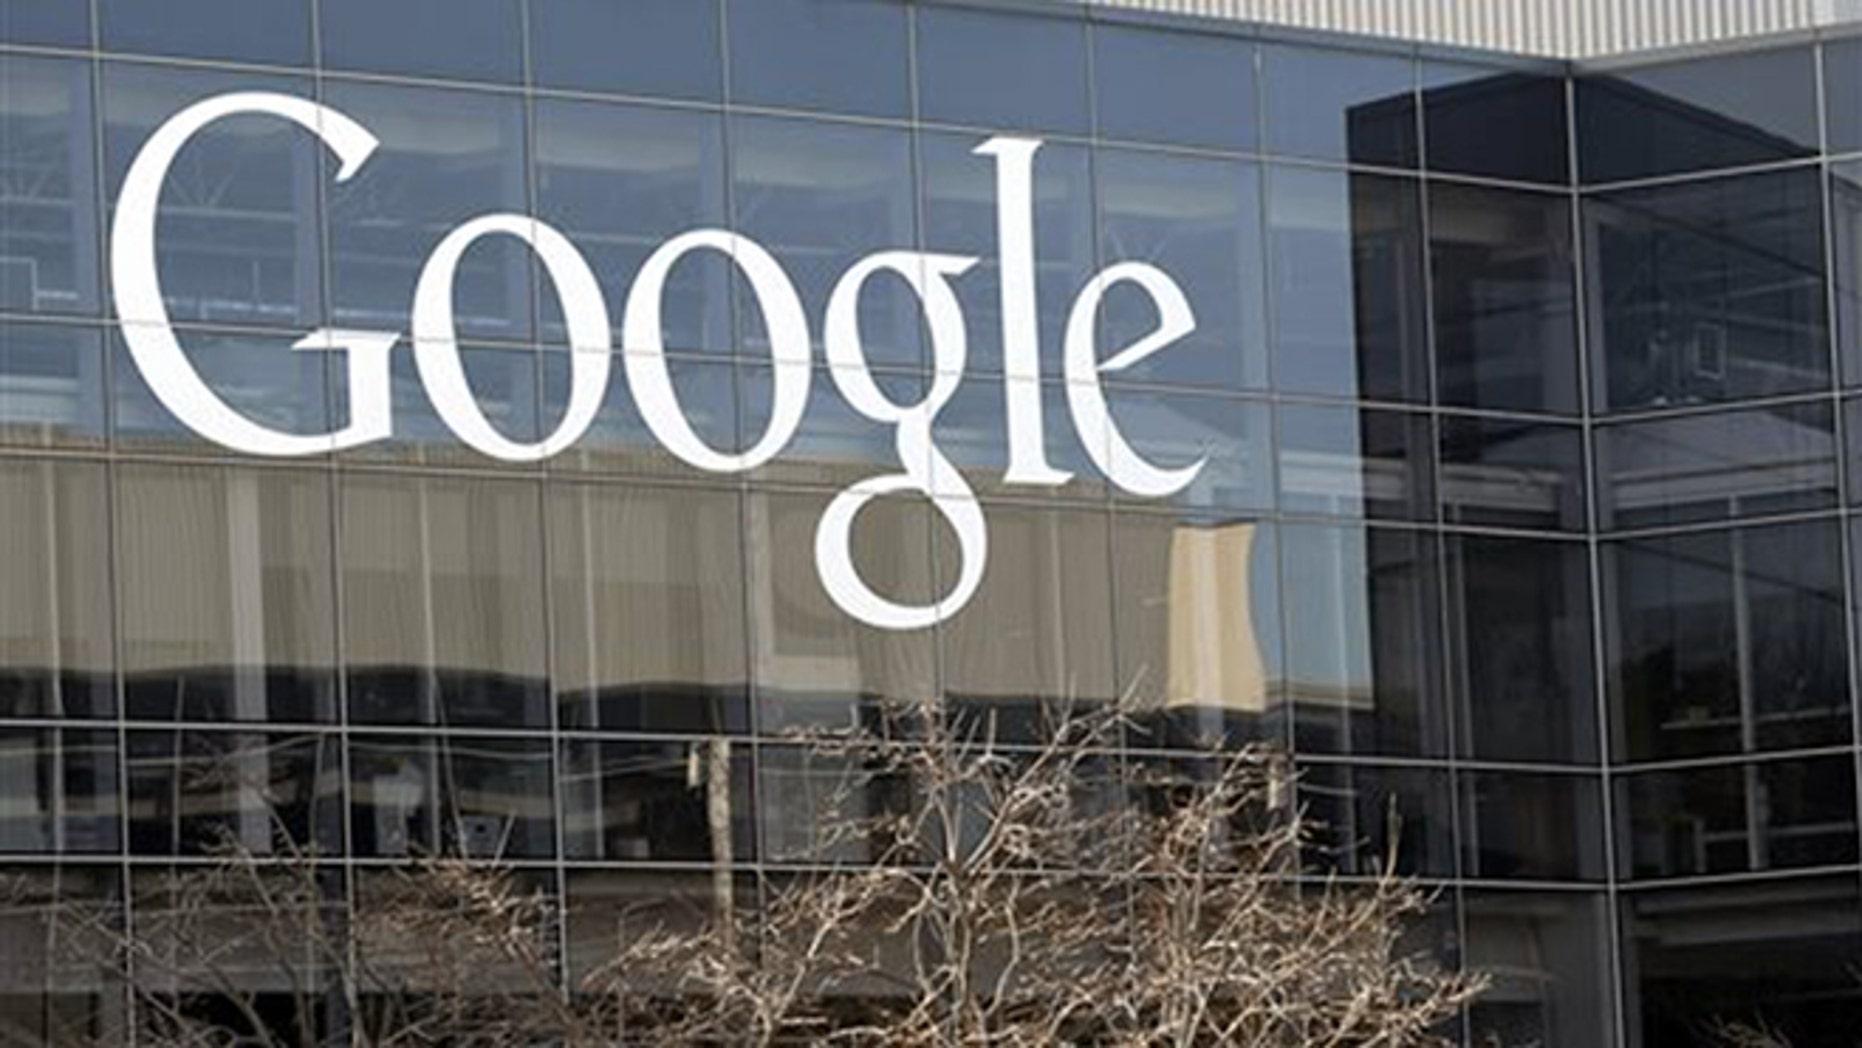 FILE - This Thursday, Jan. 3, 2013, photo shows Google's headquarters in Mountain View, Calif. (AP Photo/Marcio Jose Sanchez, File)